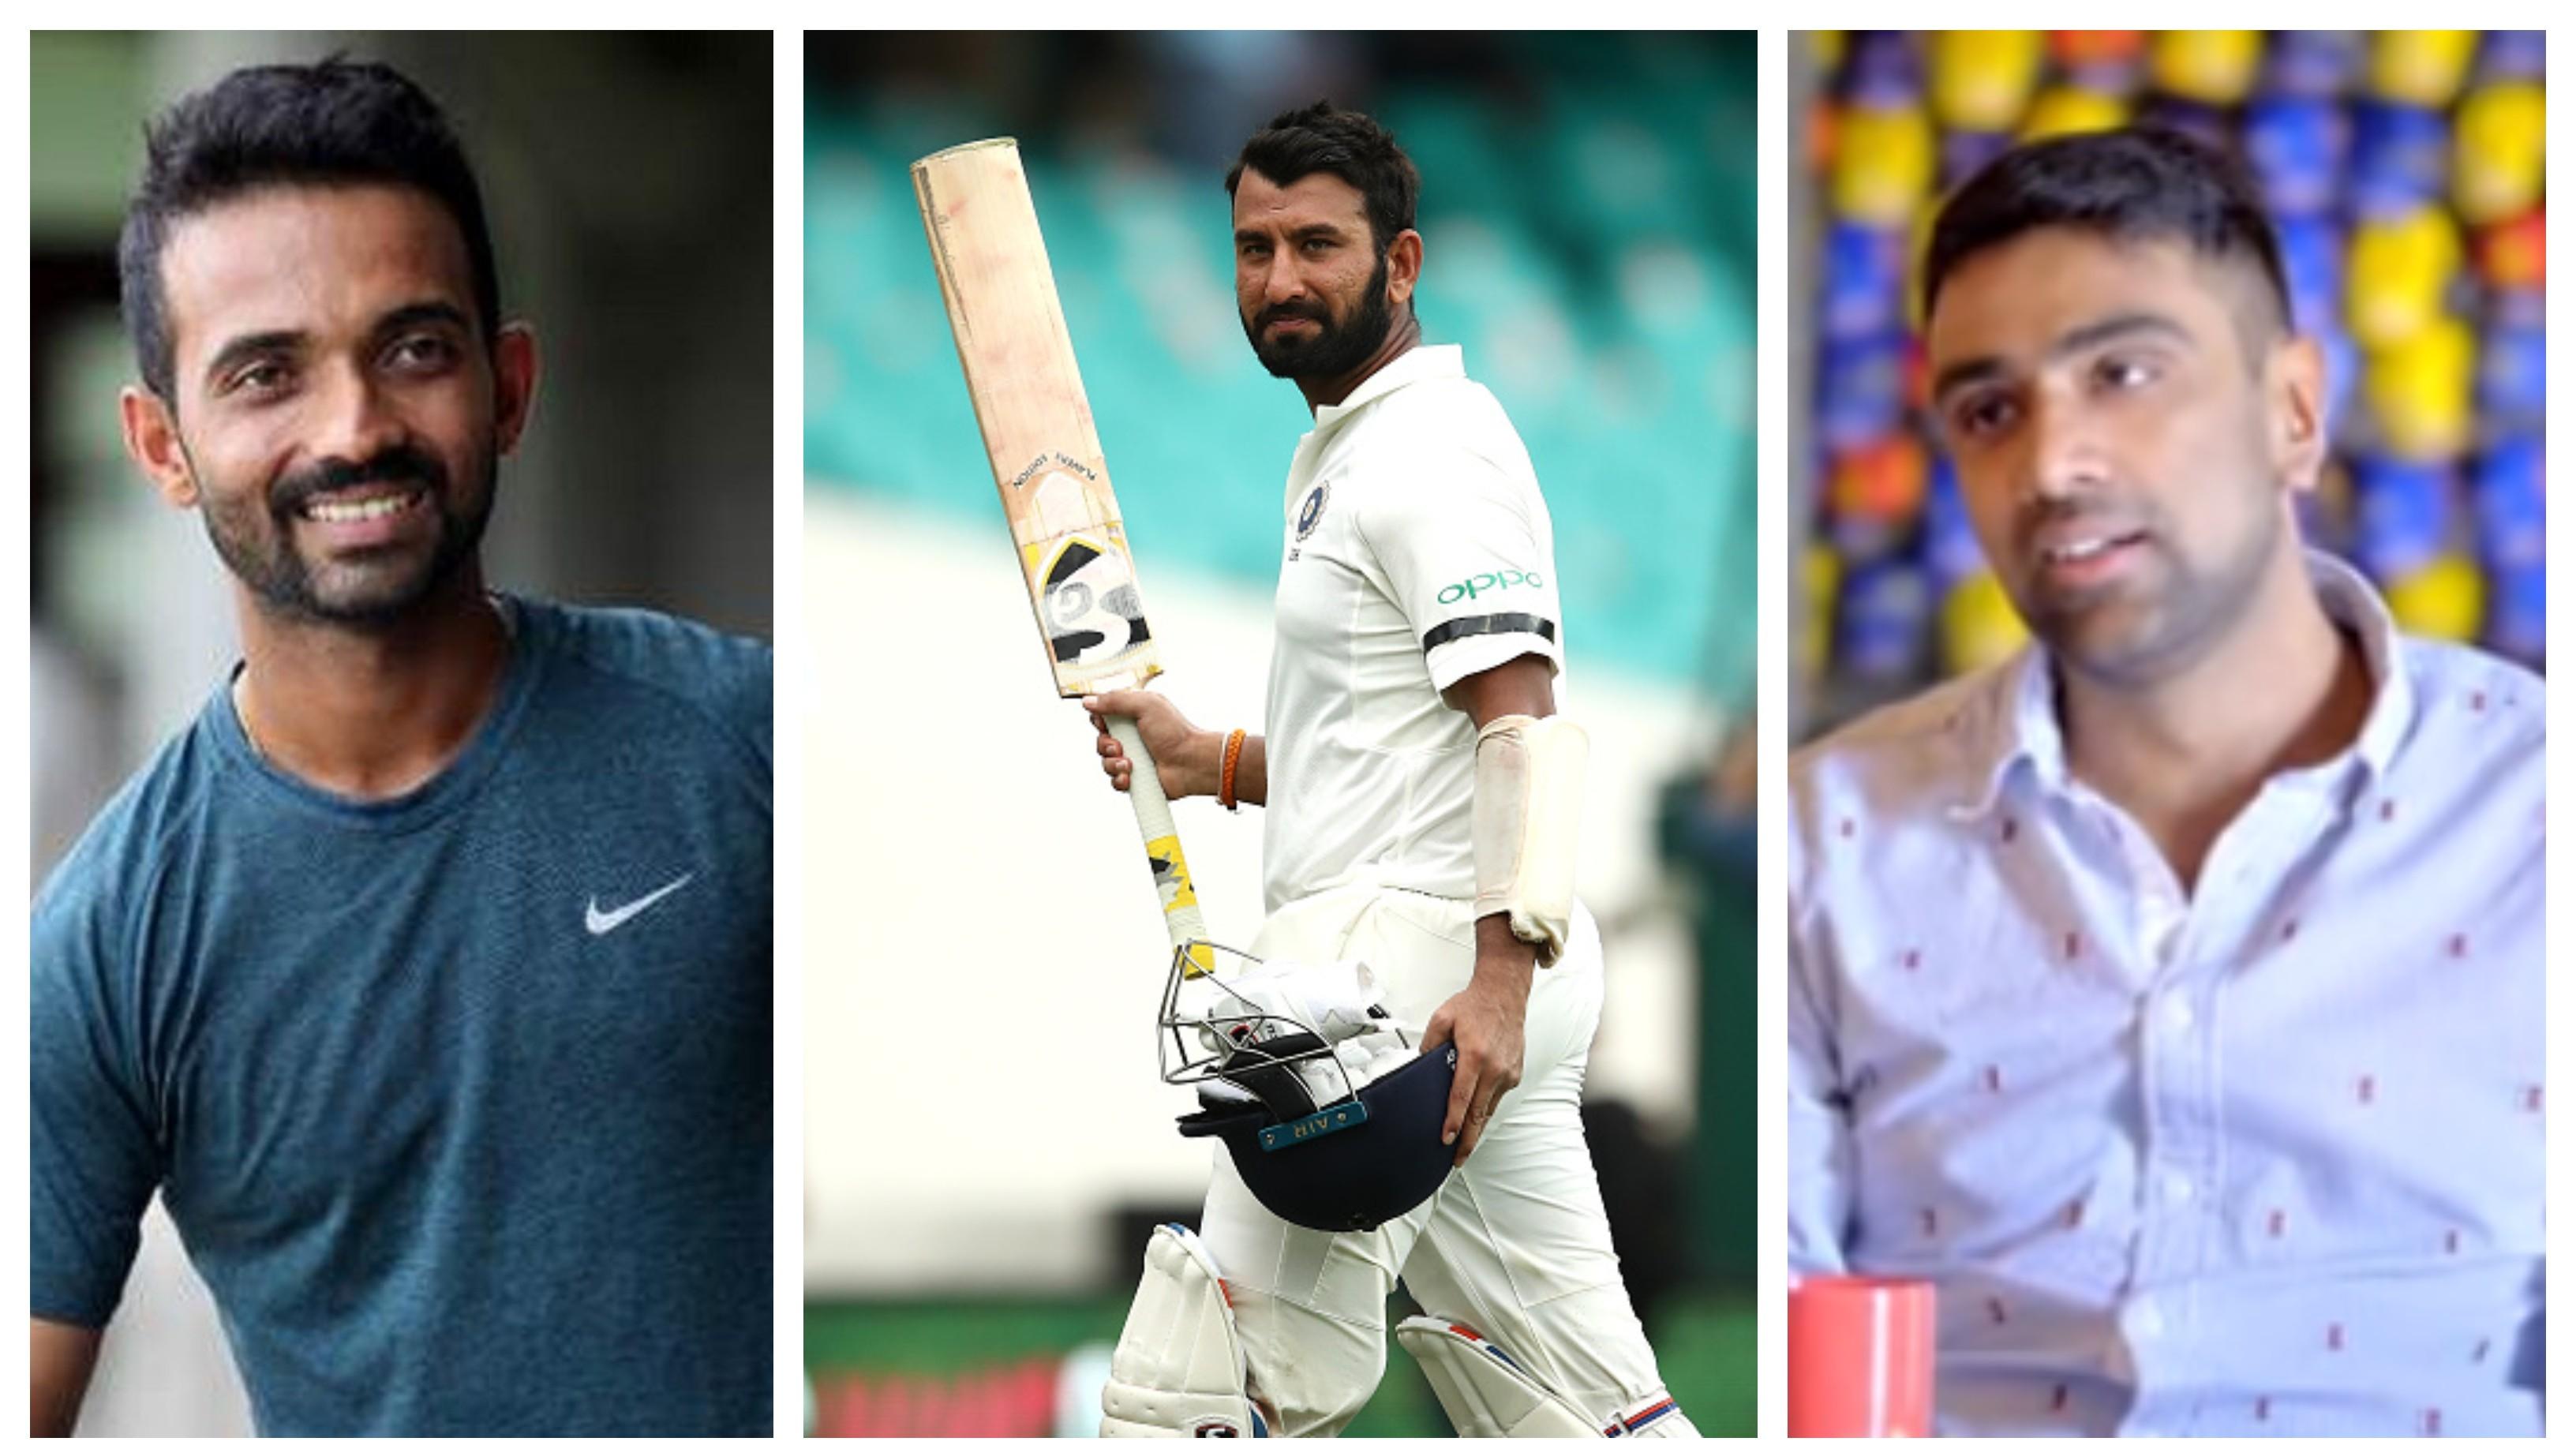 Cricket fraternity wishes Cheteshwar Pujara on his 32nd birthday